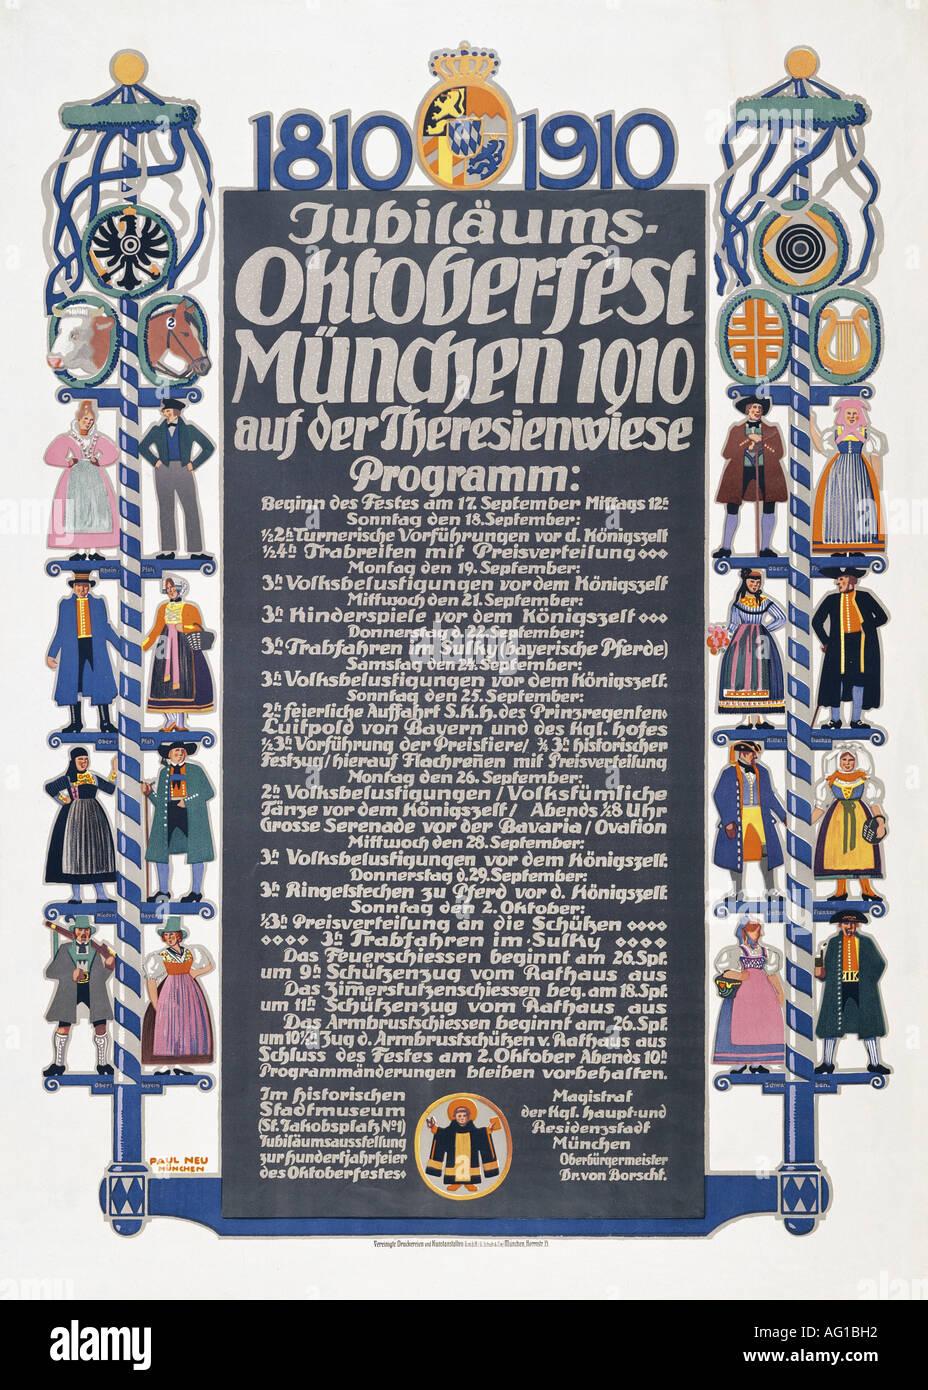 Poster design 1940 - Stock Photo Festivity Fairs Jubil Ums Oktoberfest Munich 1910 Poster Design By Paul Neu 1881 1940 Advertising Fine Arts Histo